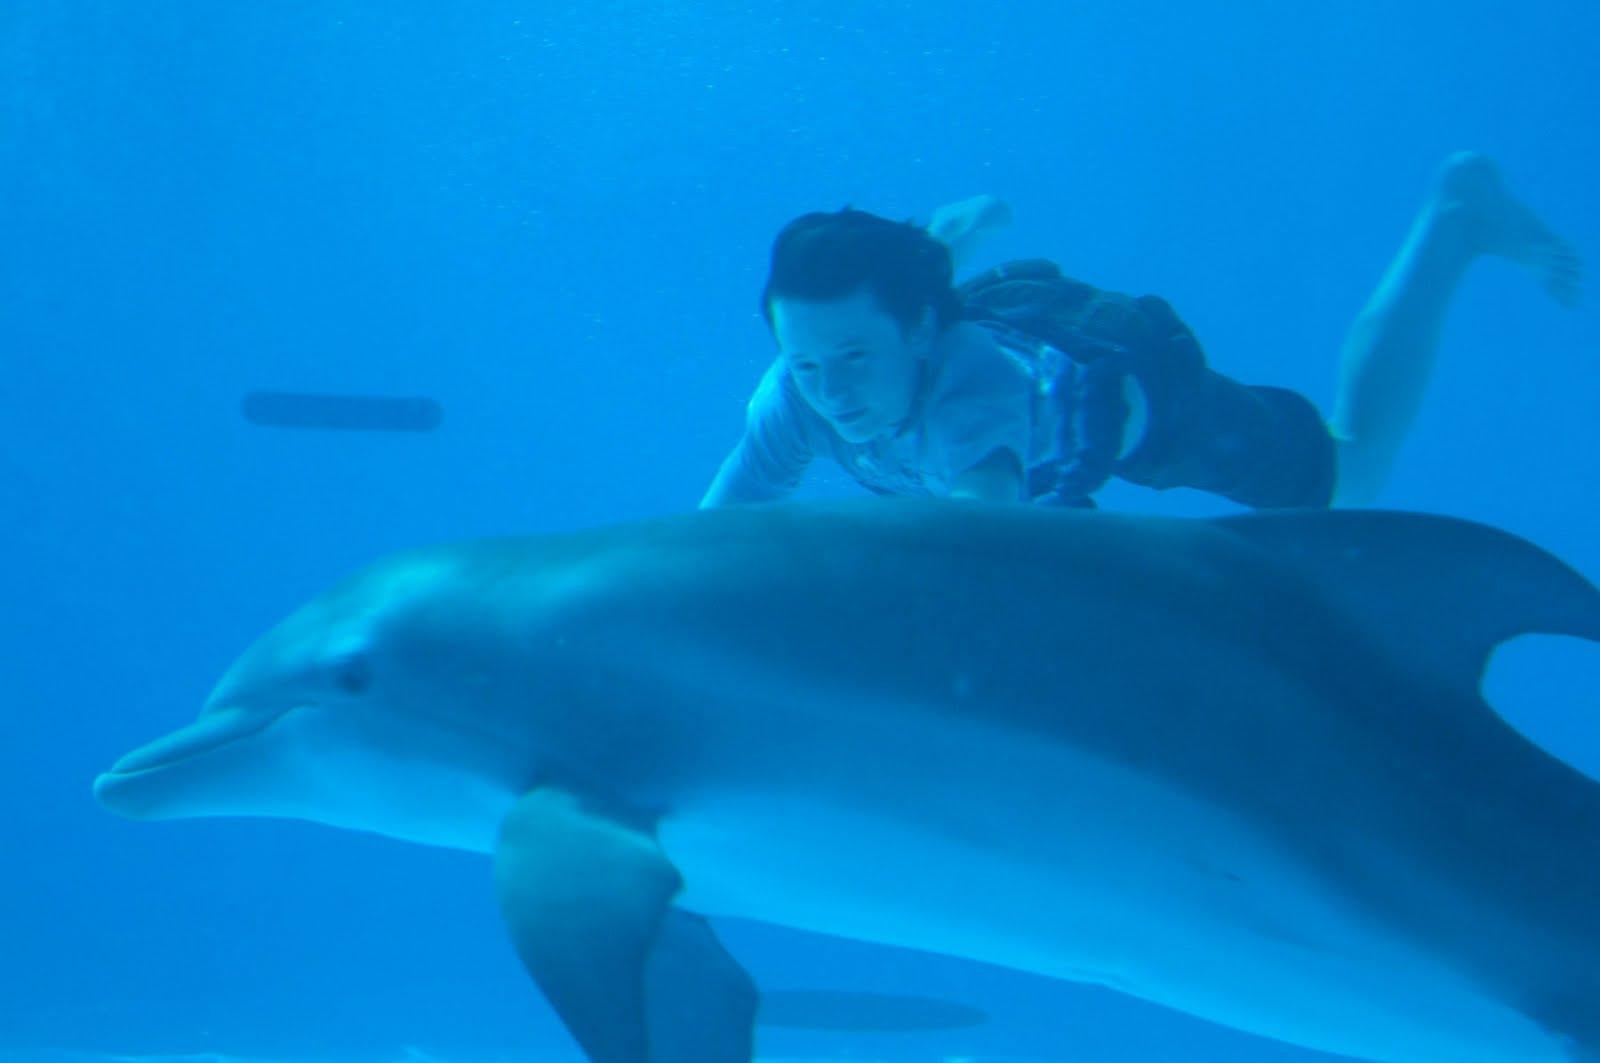 http://1.bp.blogspot.com/-uzA--8kDPso/TZ5VwFBQX8I/AAAAAAAAACo/r9wtMxUXvuc/s1600/Dolphin%2BTale%2BMovie.jpg